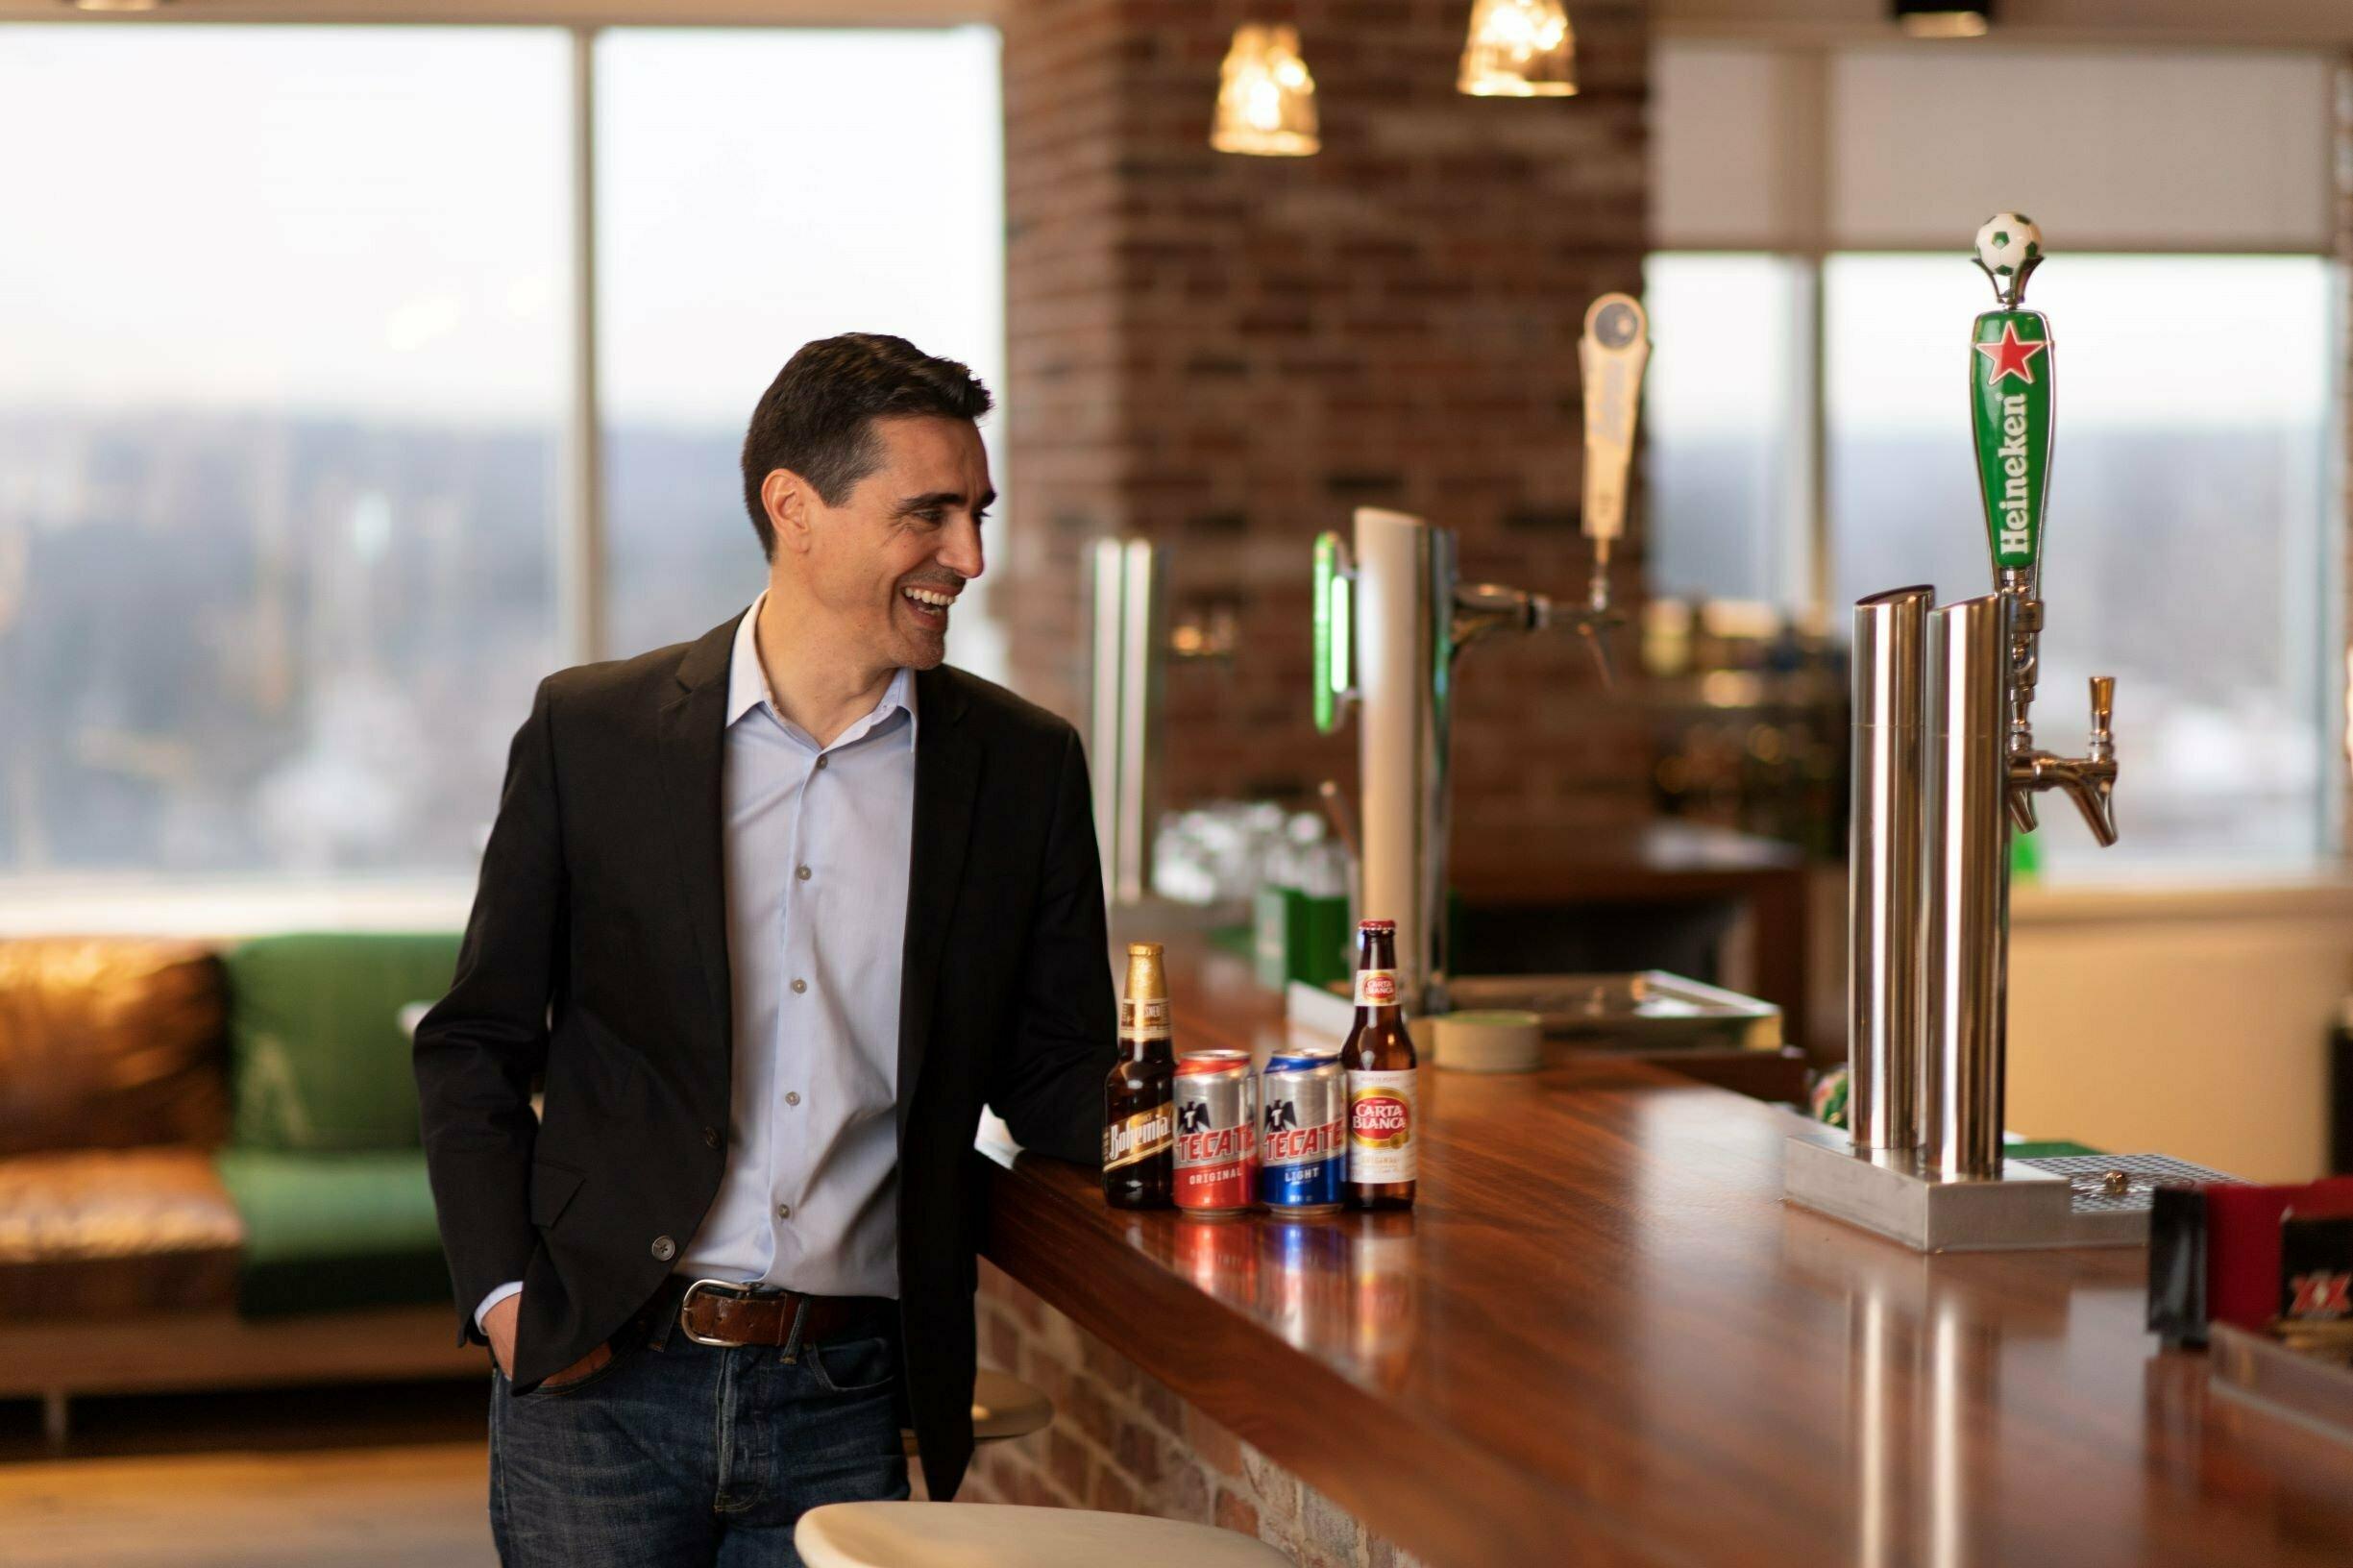 Tecate's new senior brand director Oscar Martinez